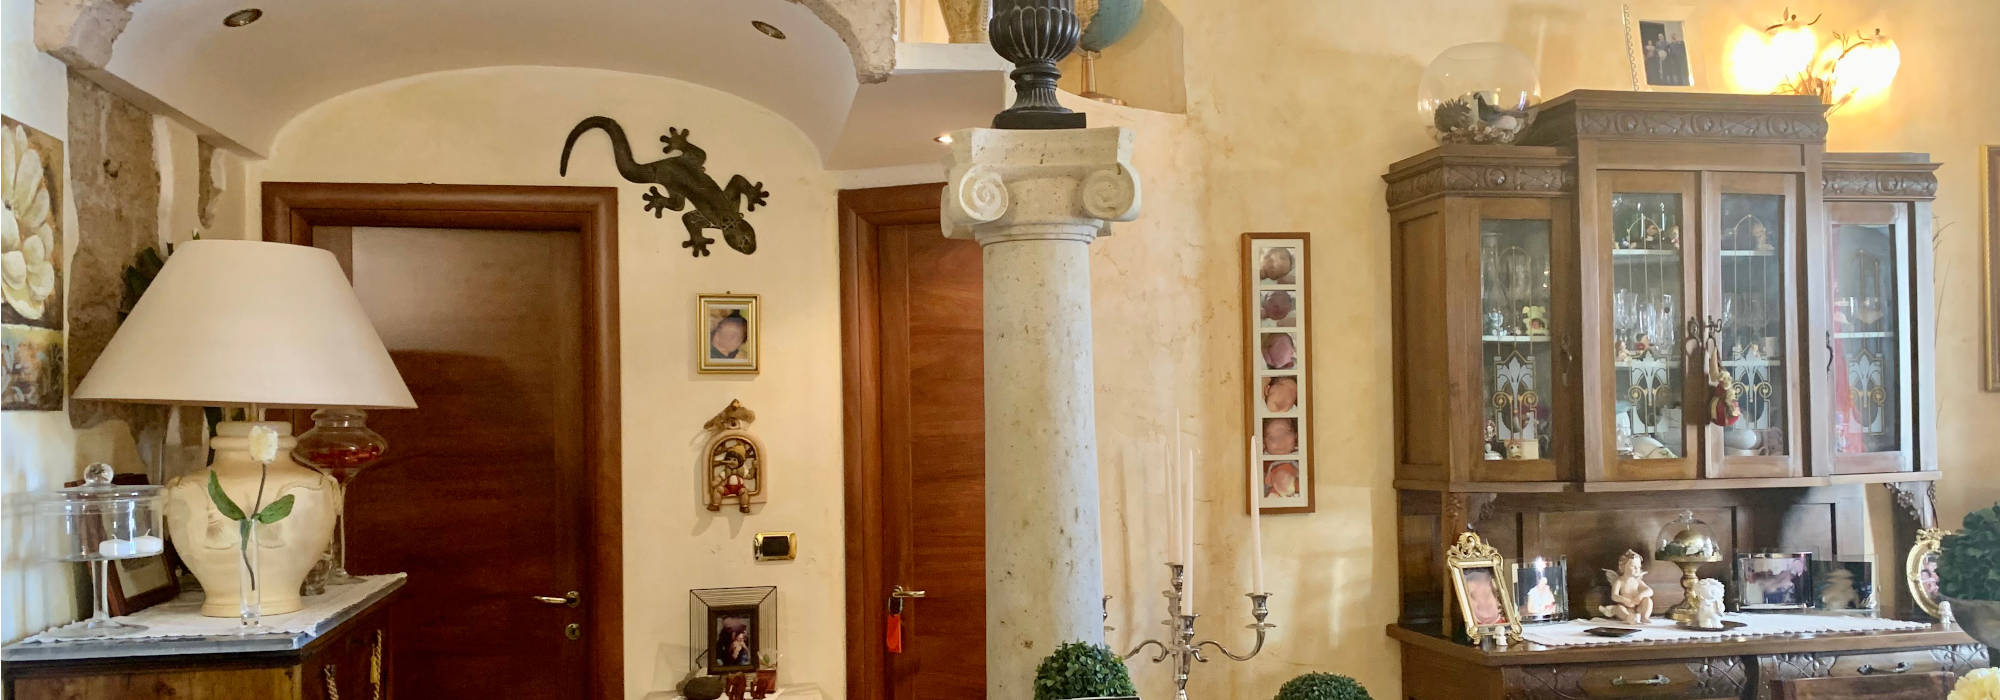 Appartamento con giardino – Via G.Deledda Alghero